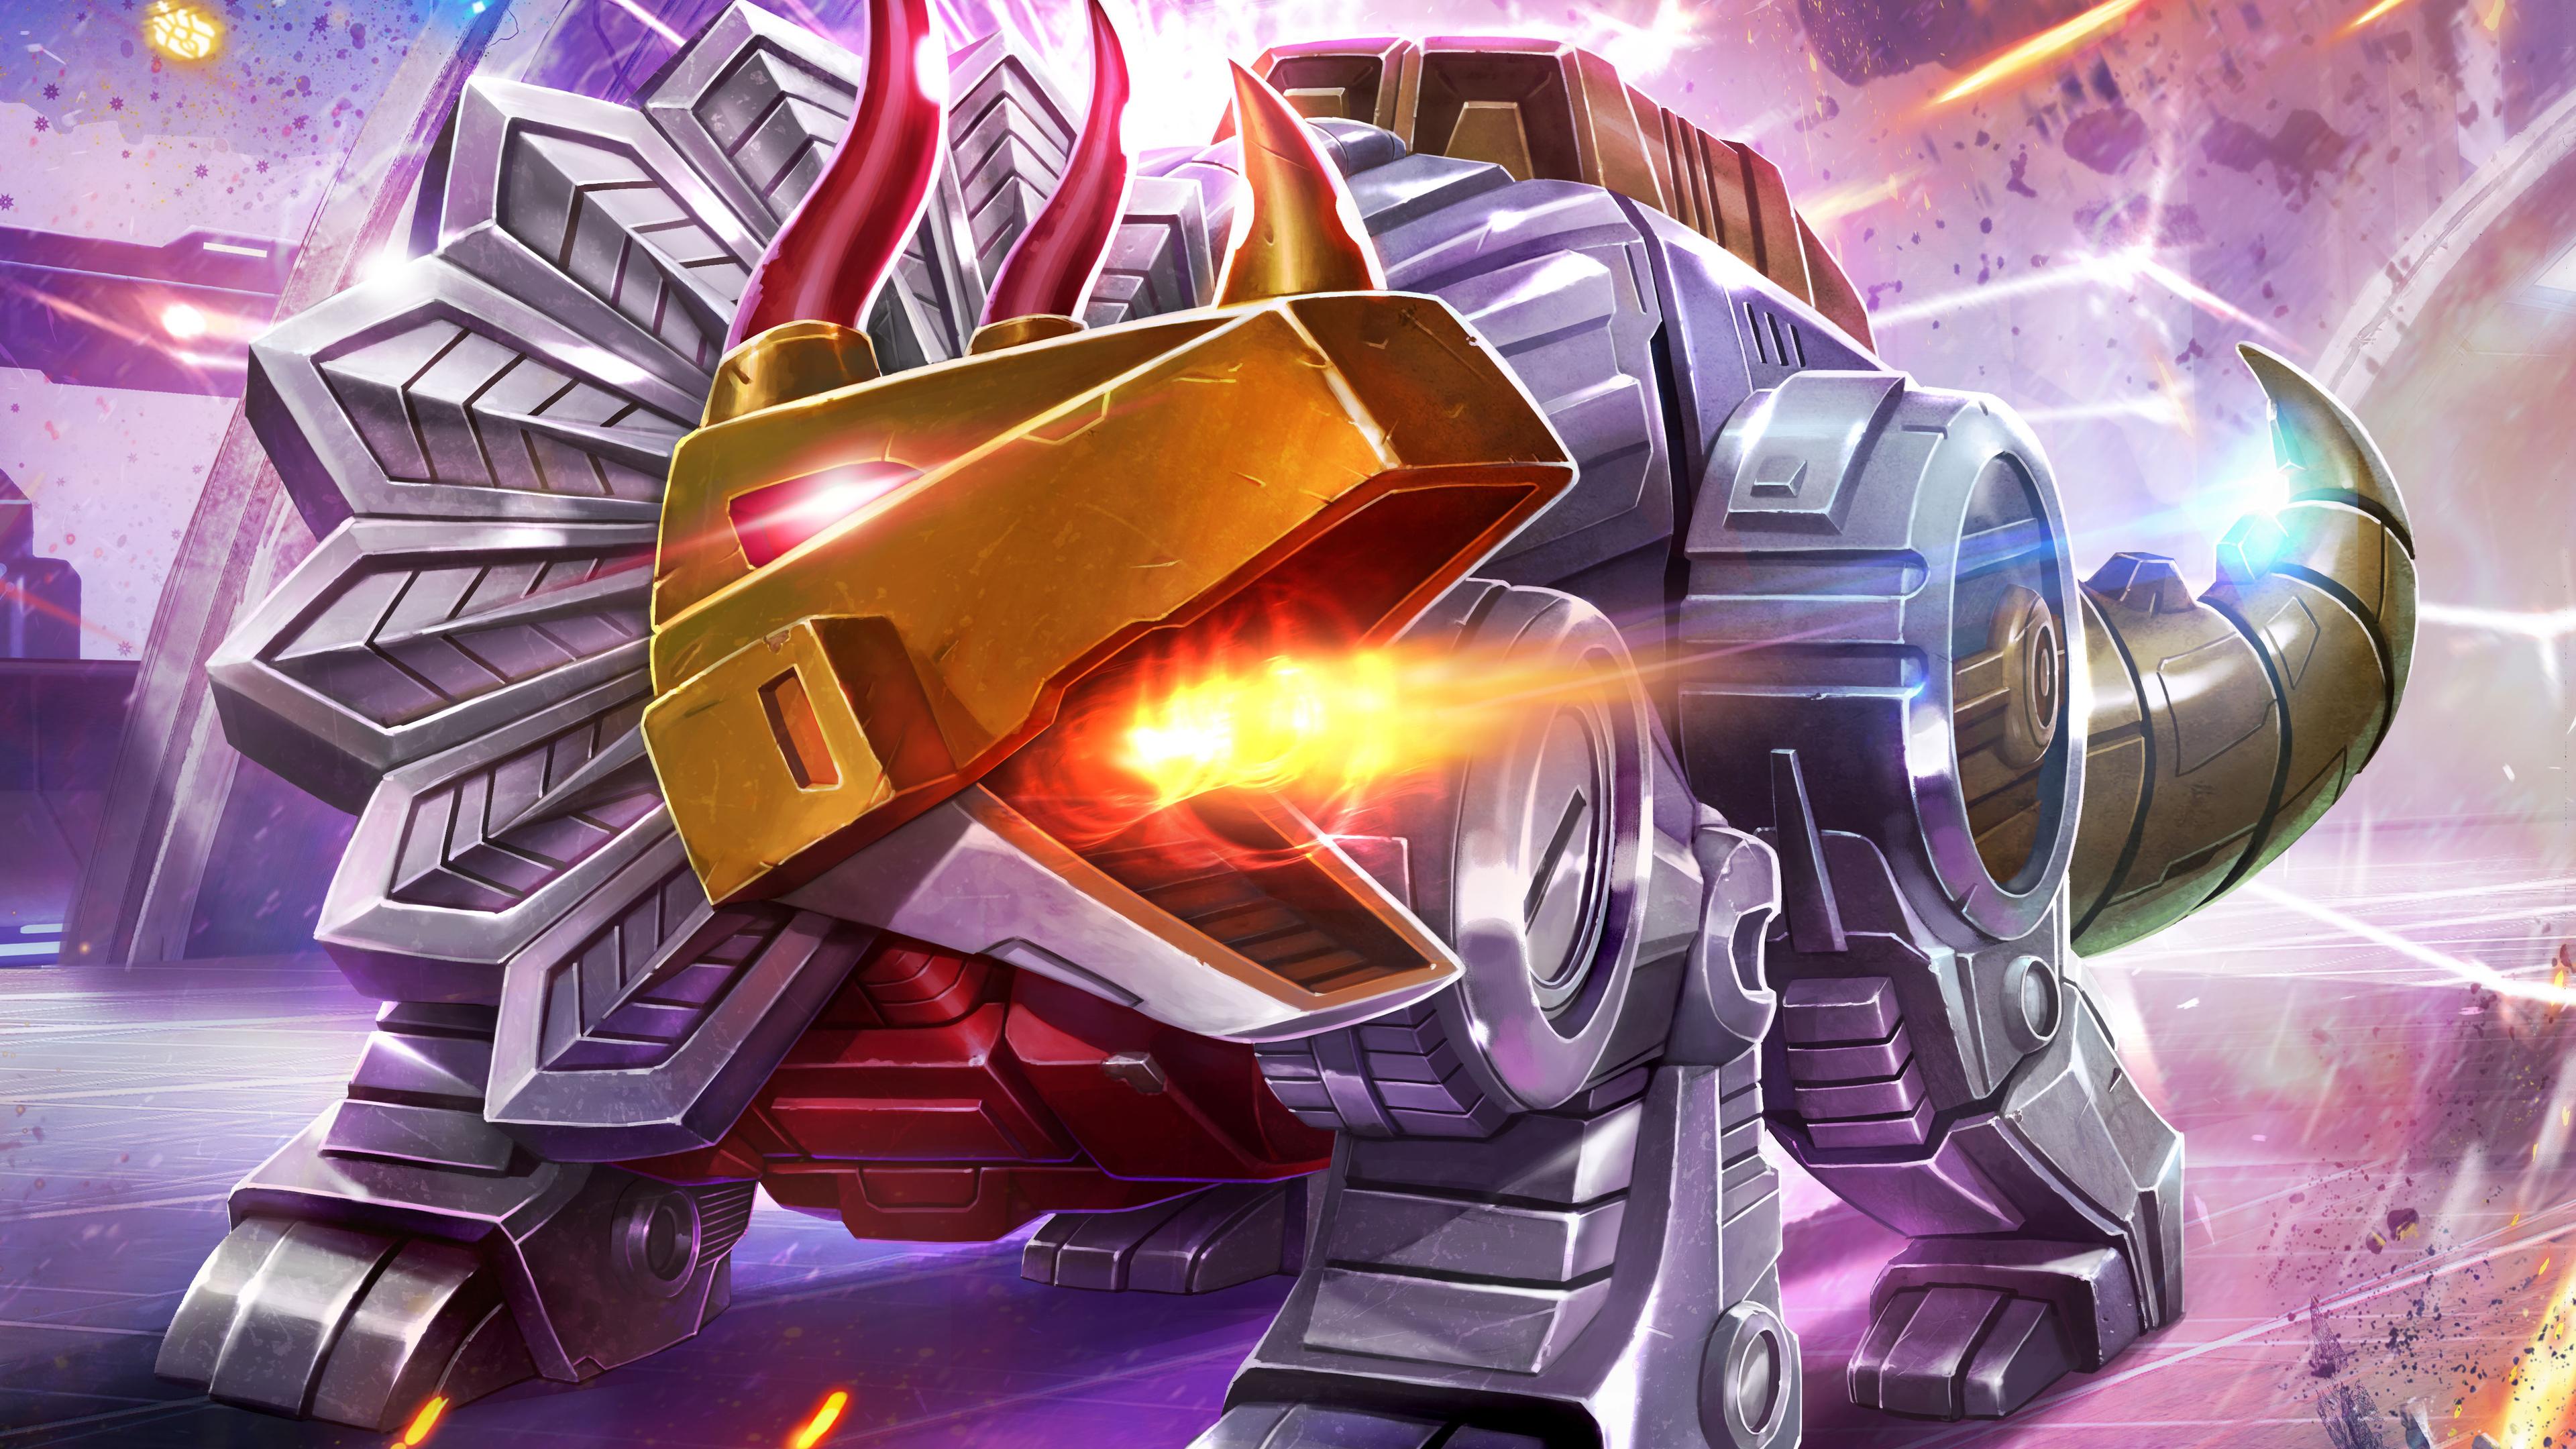 dinobots transformers art 5k 1541294284 - Dinobots Transformers Art 5k - transformers wallpapers, superheroes wallpapers, hd-wallpapers, 5k wallpapers, 4k-wallpapers